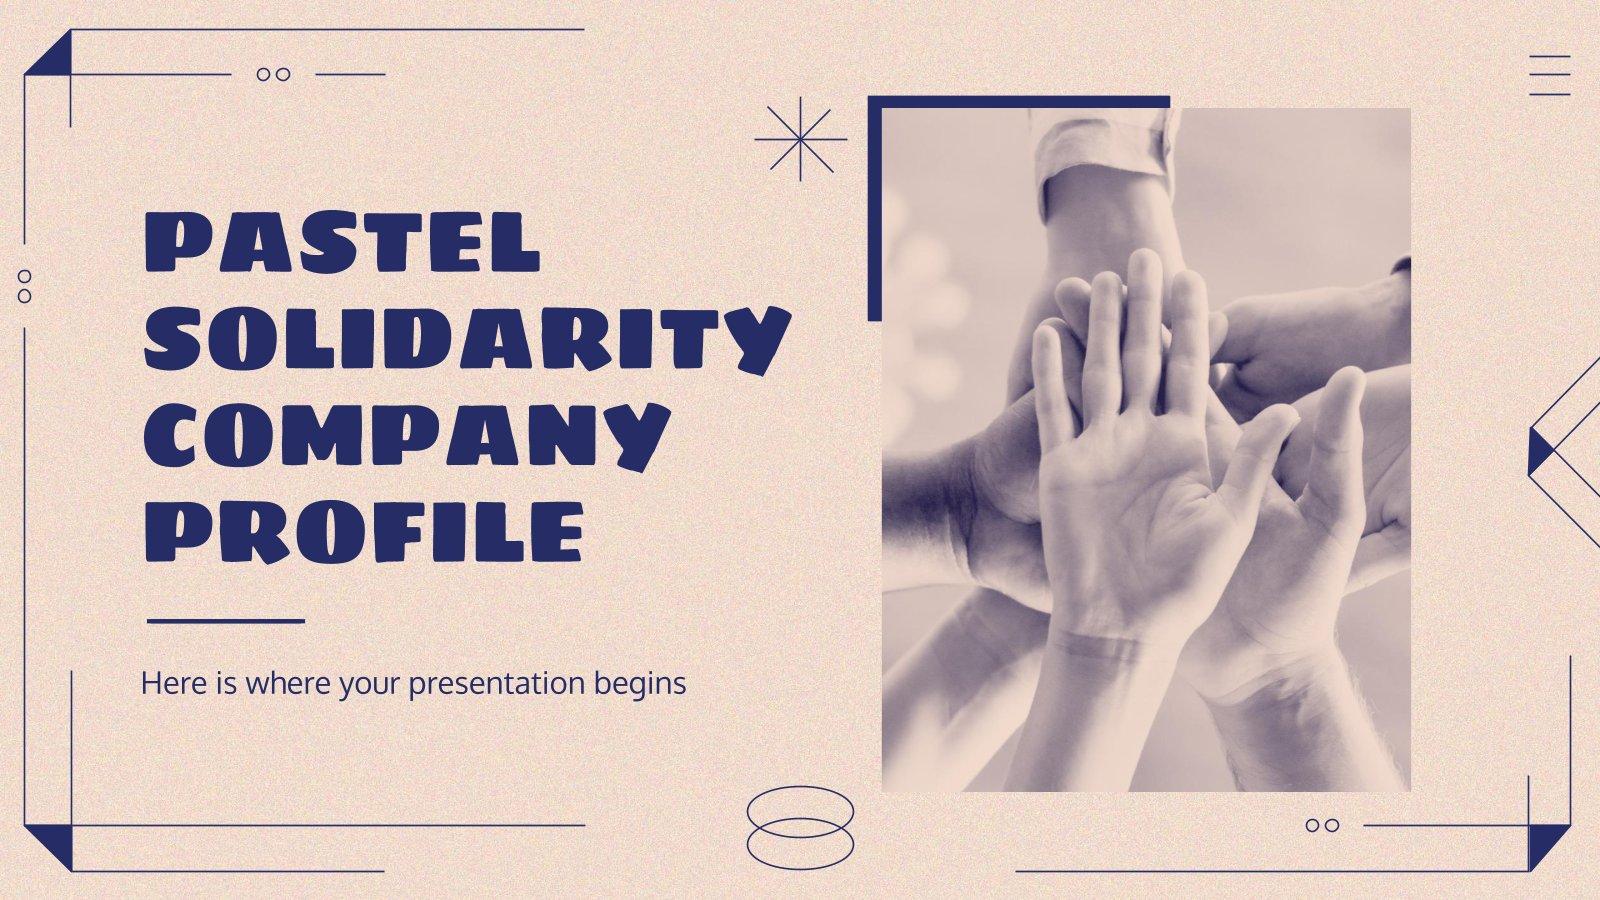 Pastel Solidarity Company Profile presentation template